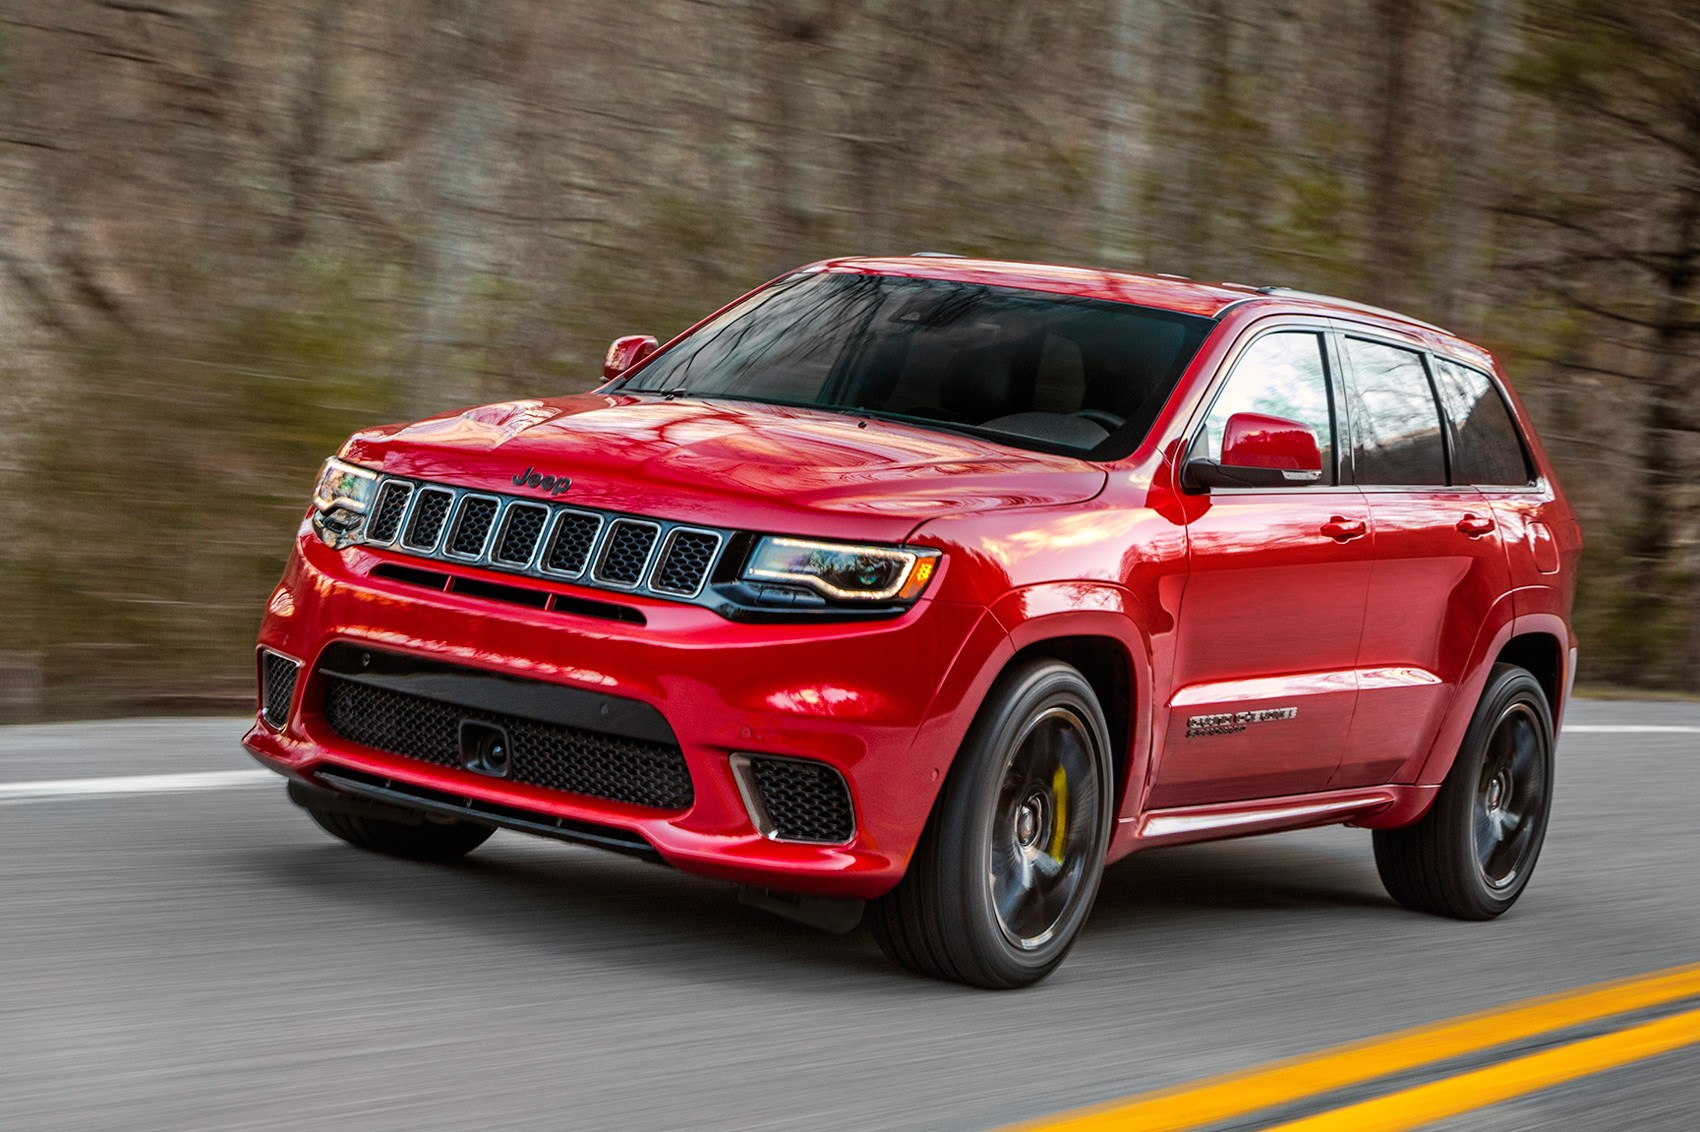 Extreme machine: Jeep Grand Cherokee Trackhawk the most powerful SUV ...